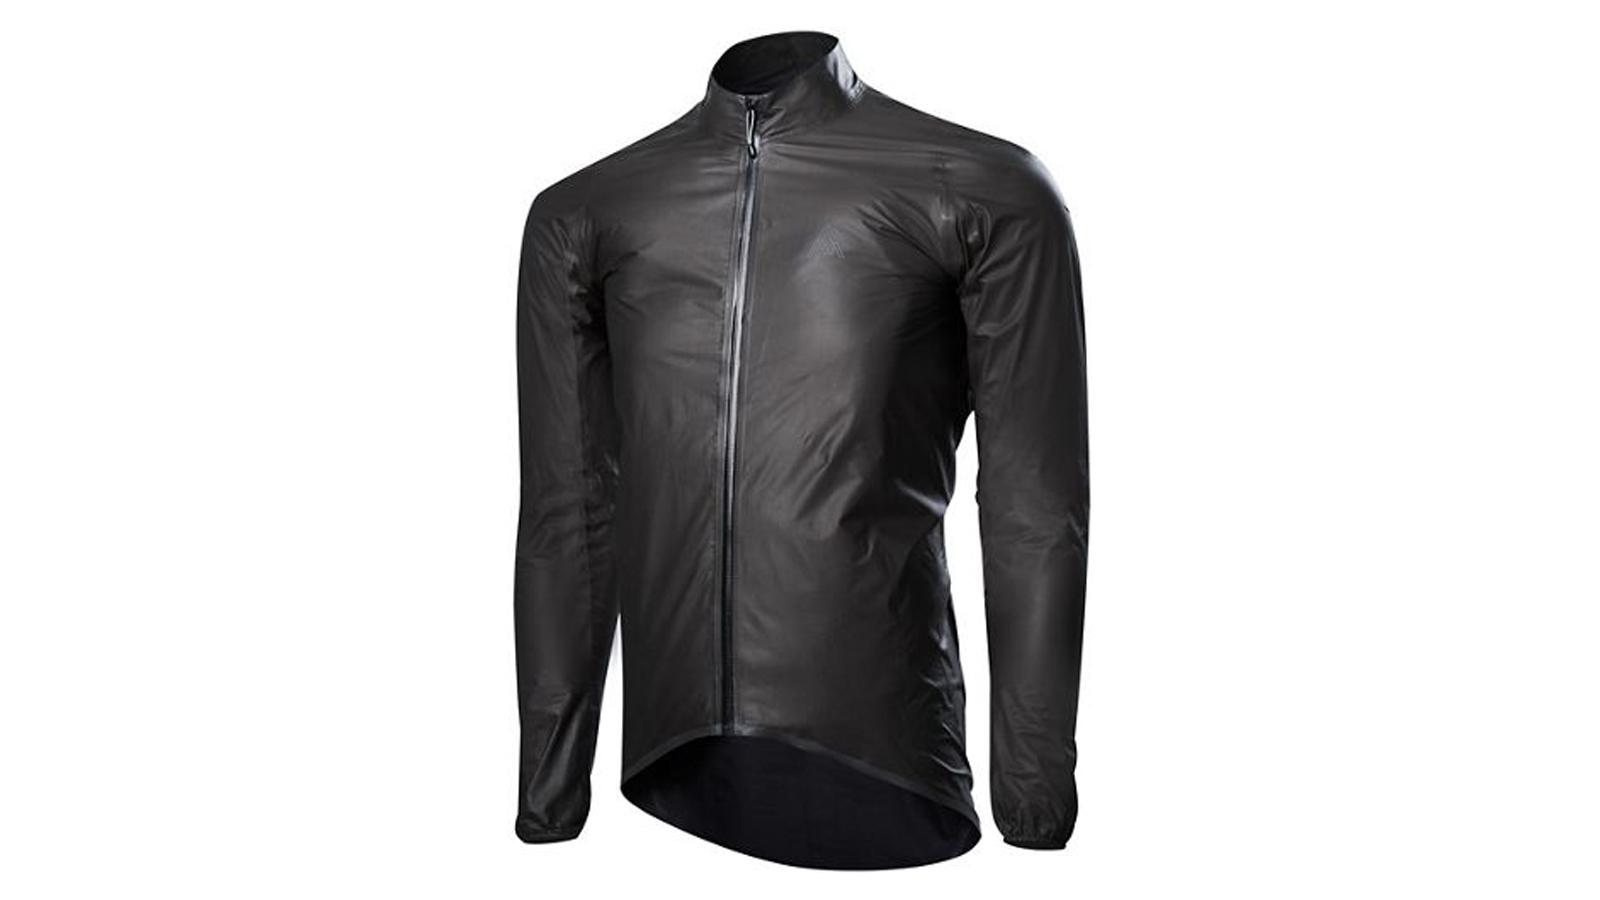 Gravel bike clothing: 7MESH ORO JACKET